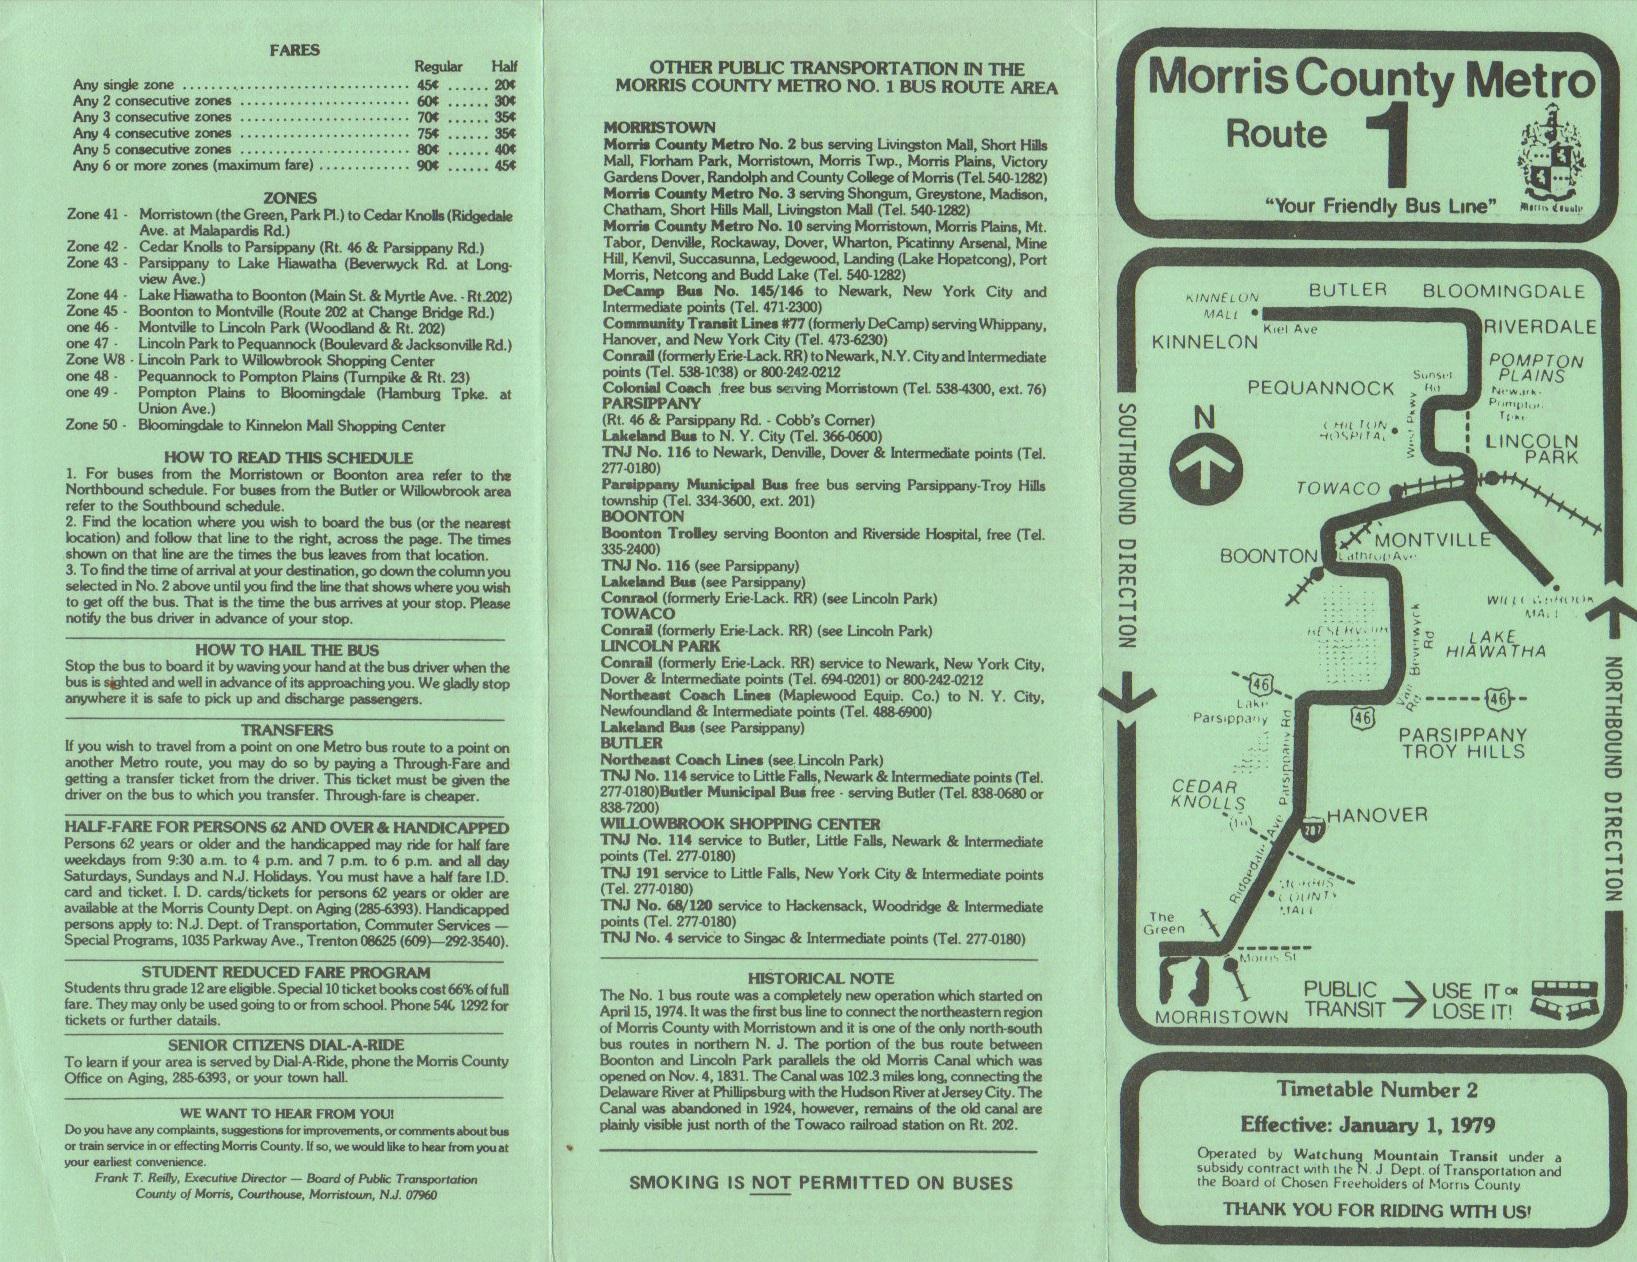 Morris County Metro - A Historical Look